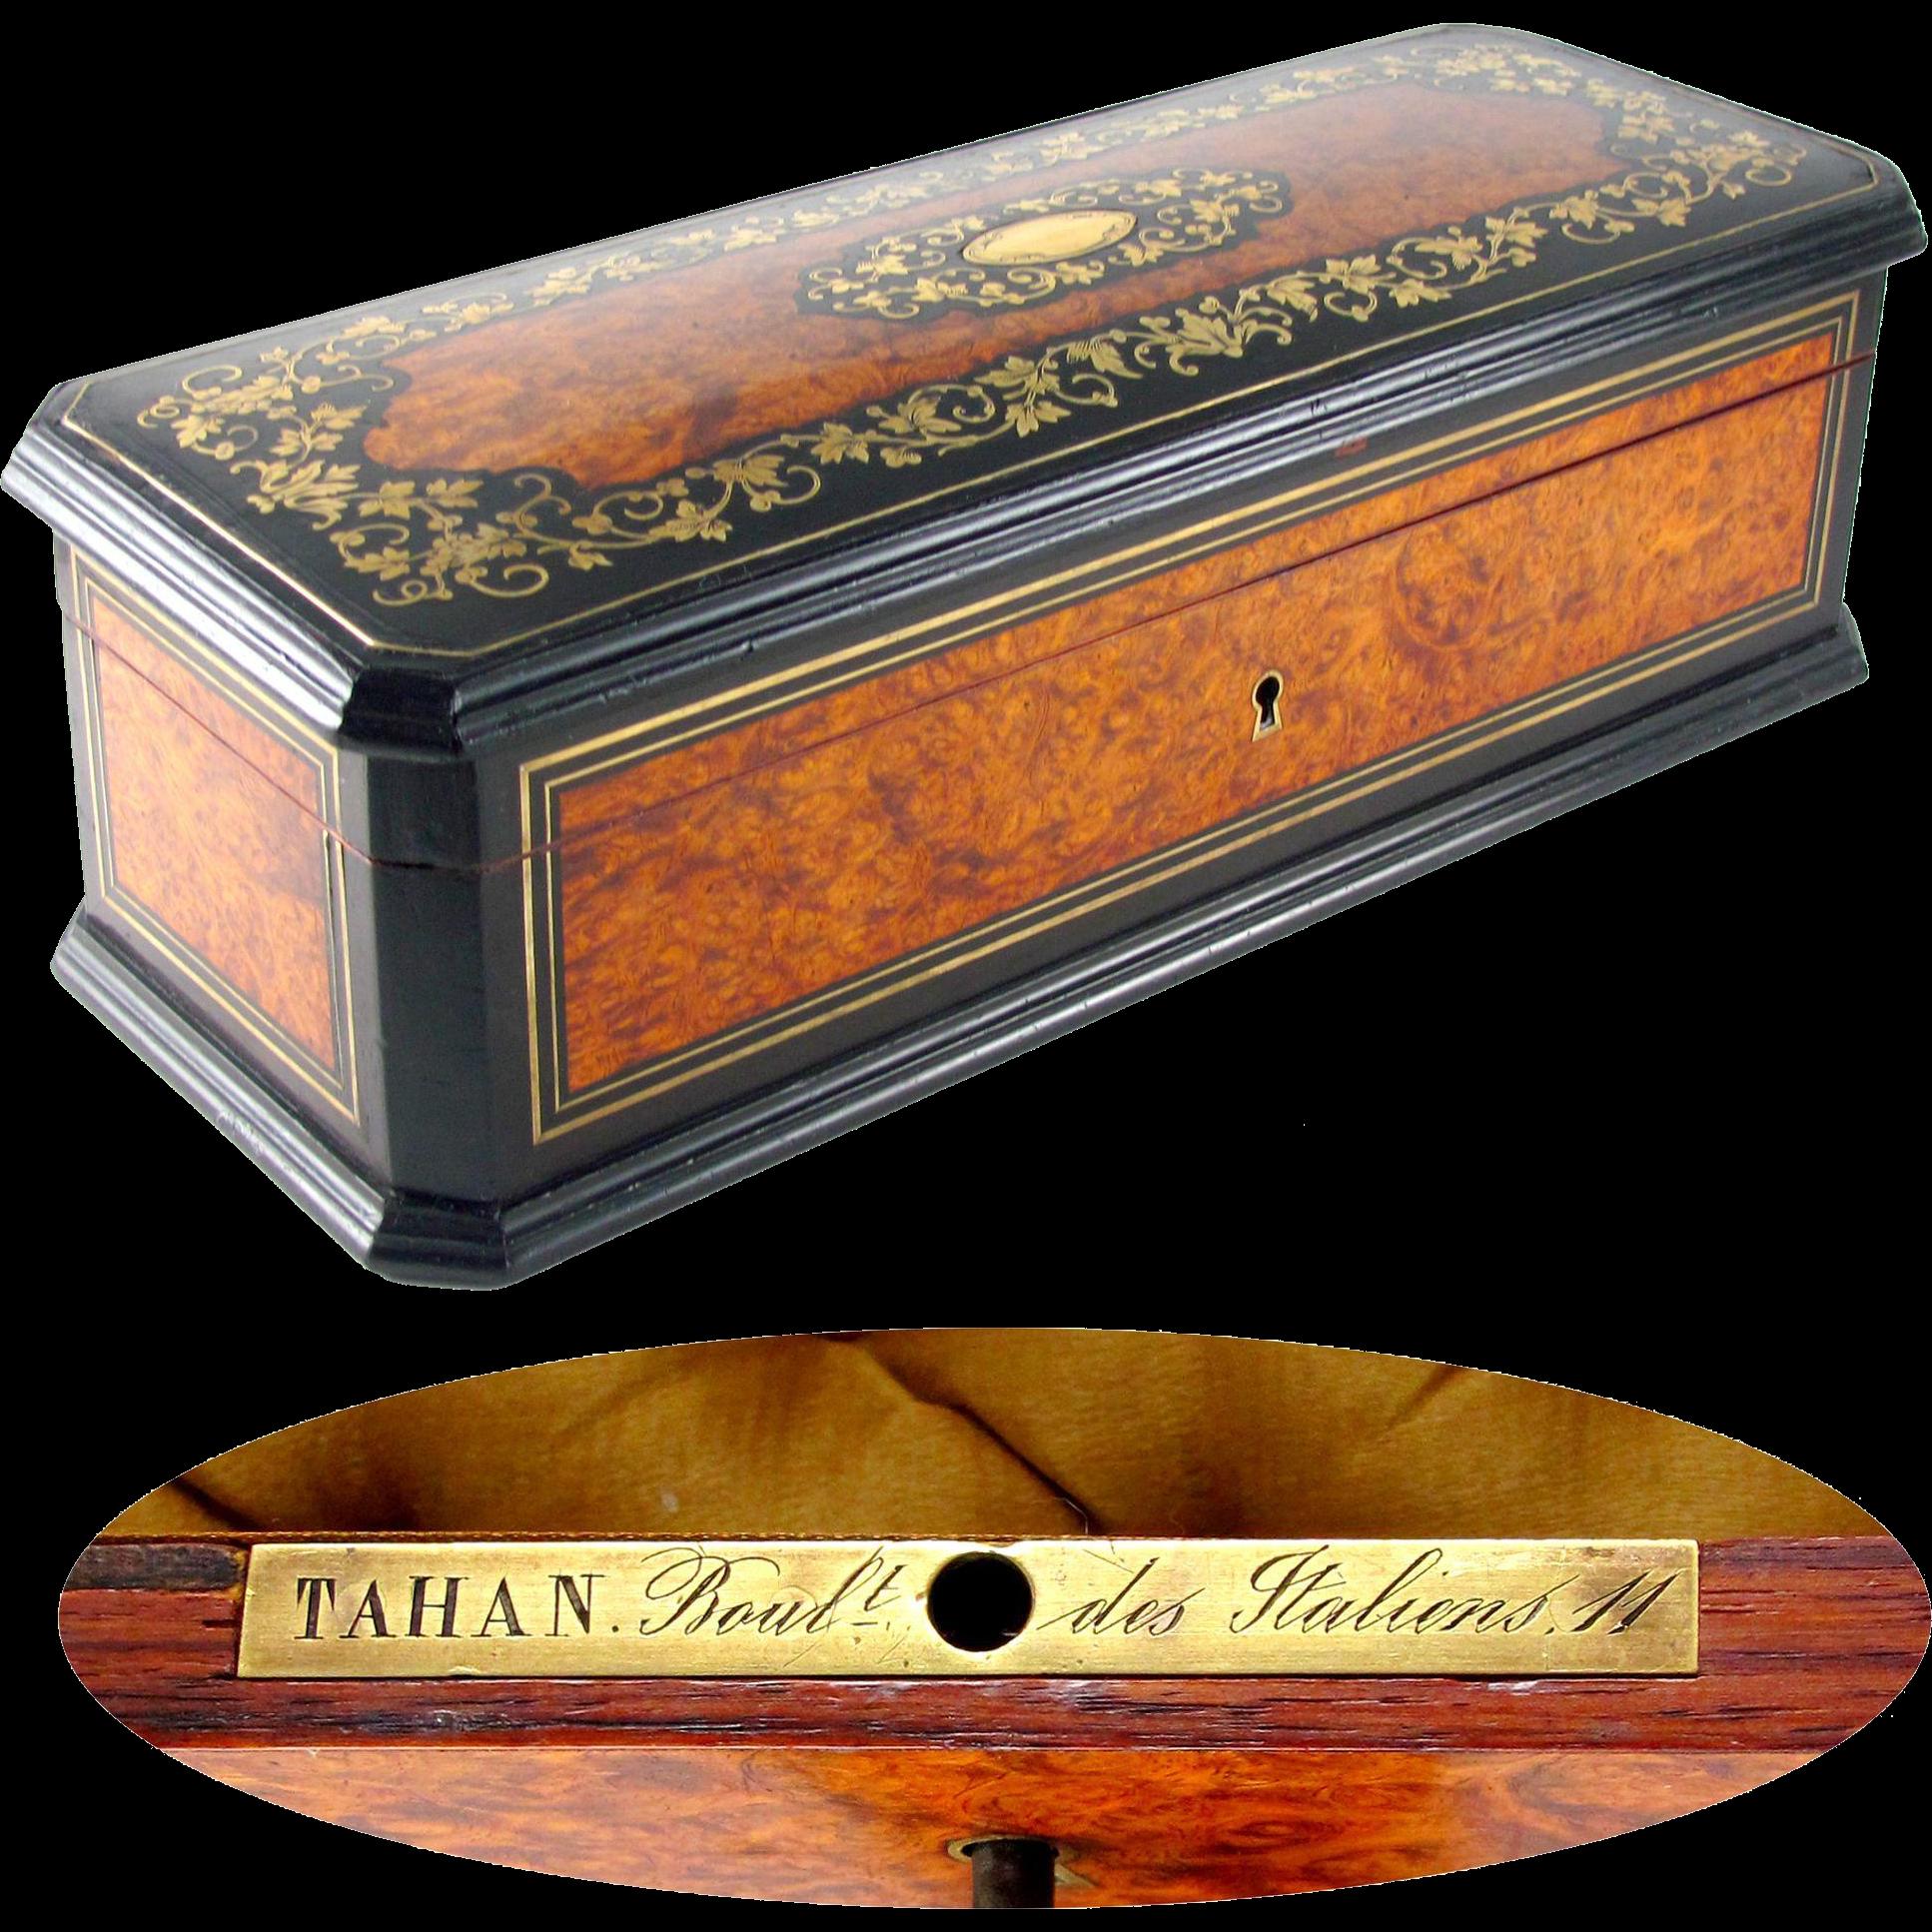 Antique French TAHAN Burl Wood Brass Inlaid Jewelry Box / Casket